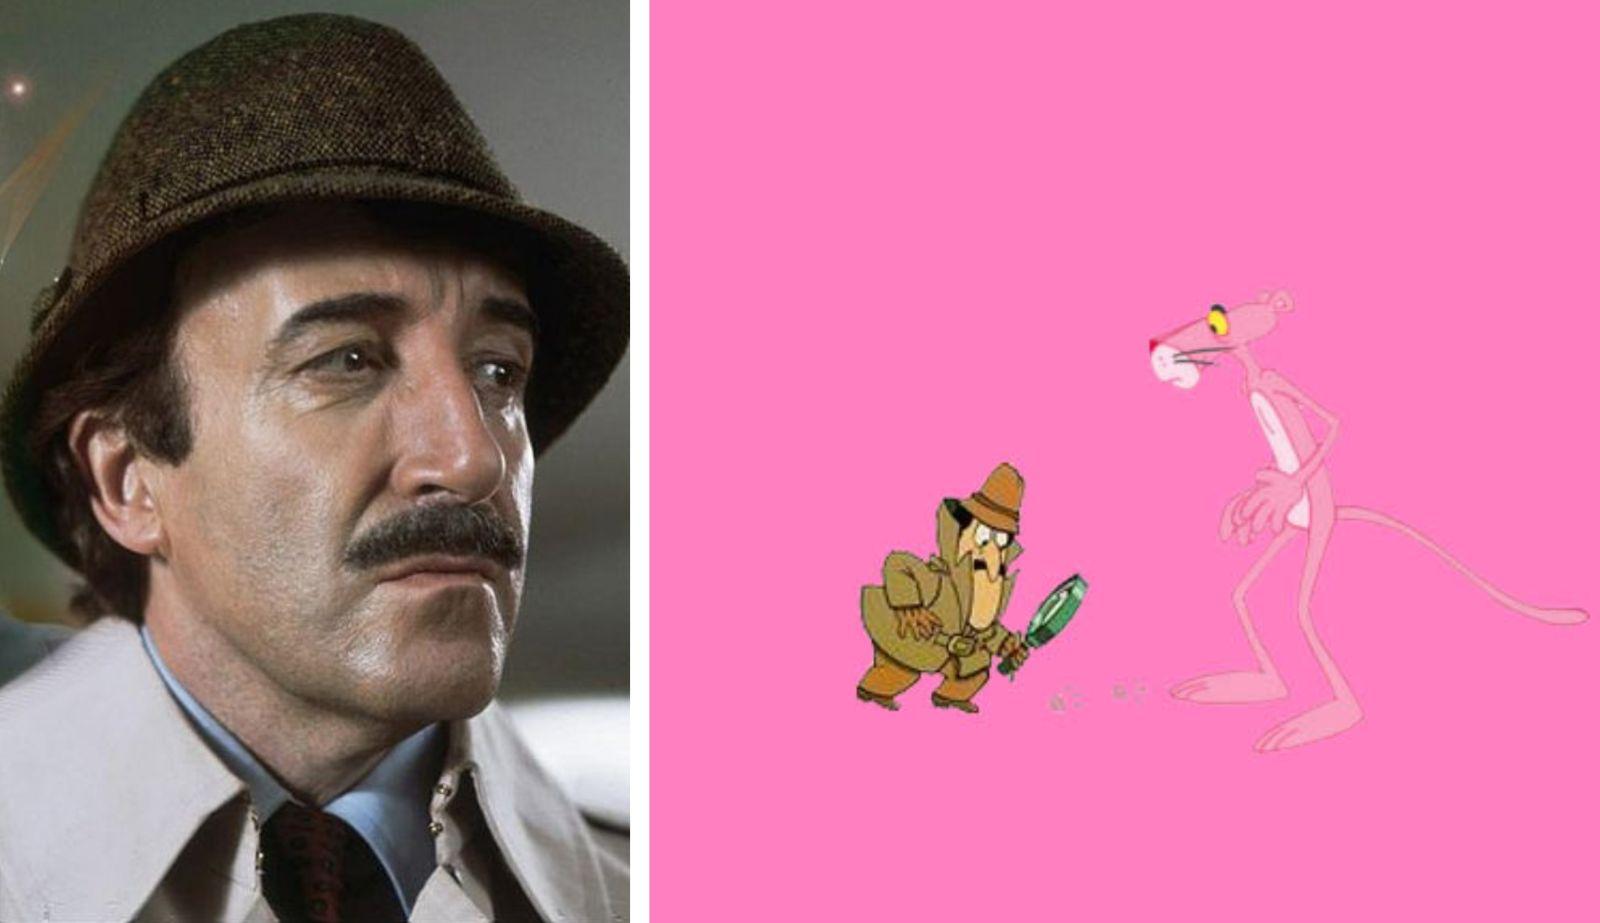 4fd443b731117a Peter Sellers jako Inspektor Clouseau i serial animowany o Różowej Panterze  (fot. Grain Sand/Flickr/public domain/ Helgi Halldórsson/CC BY-SA 2.0)